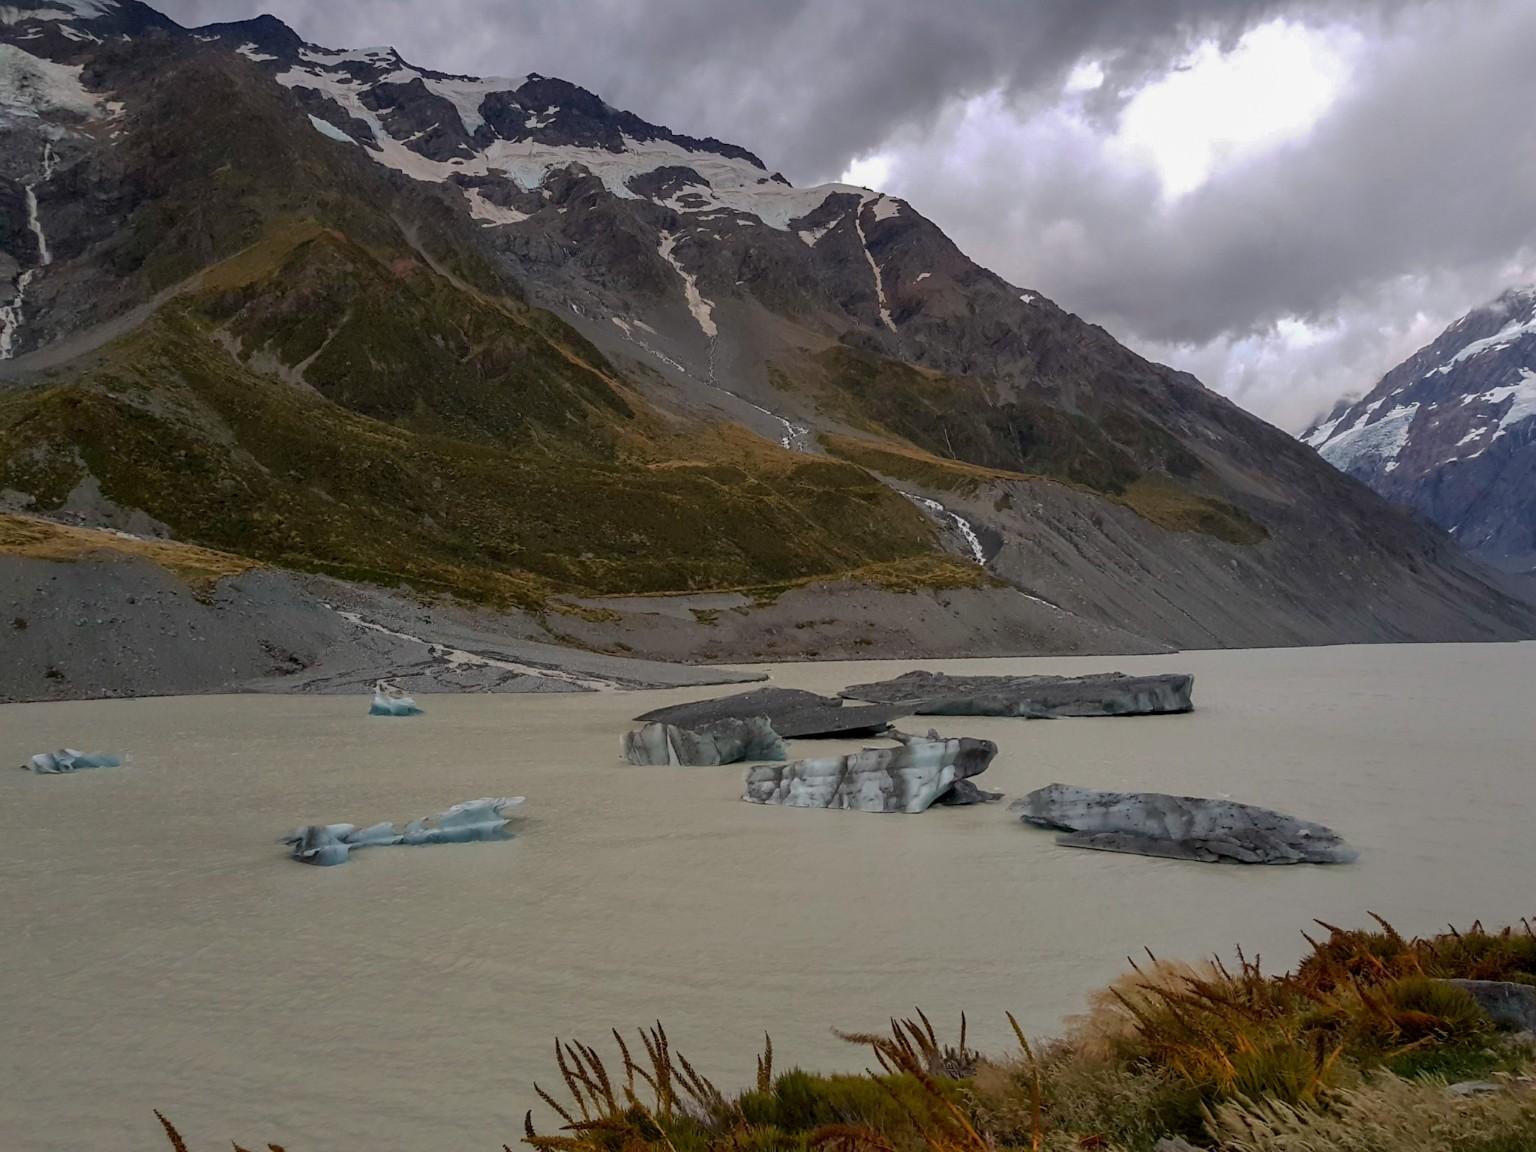 Hooker Lake mit Eisschollen